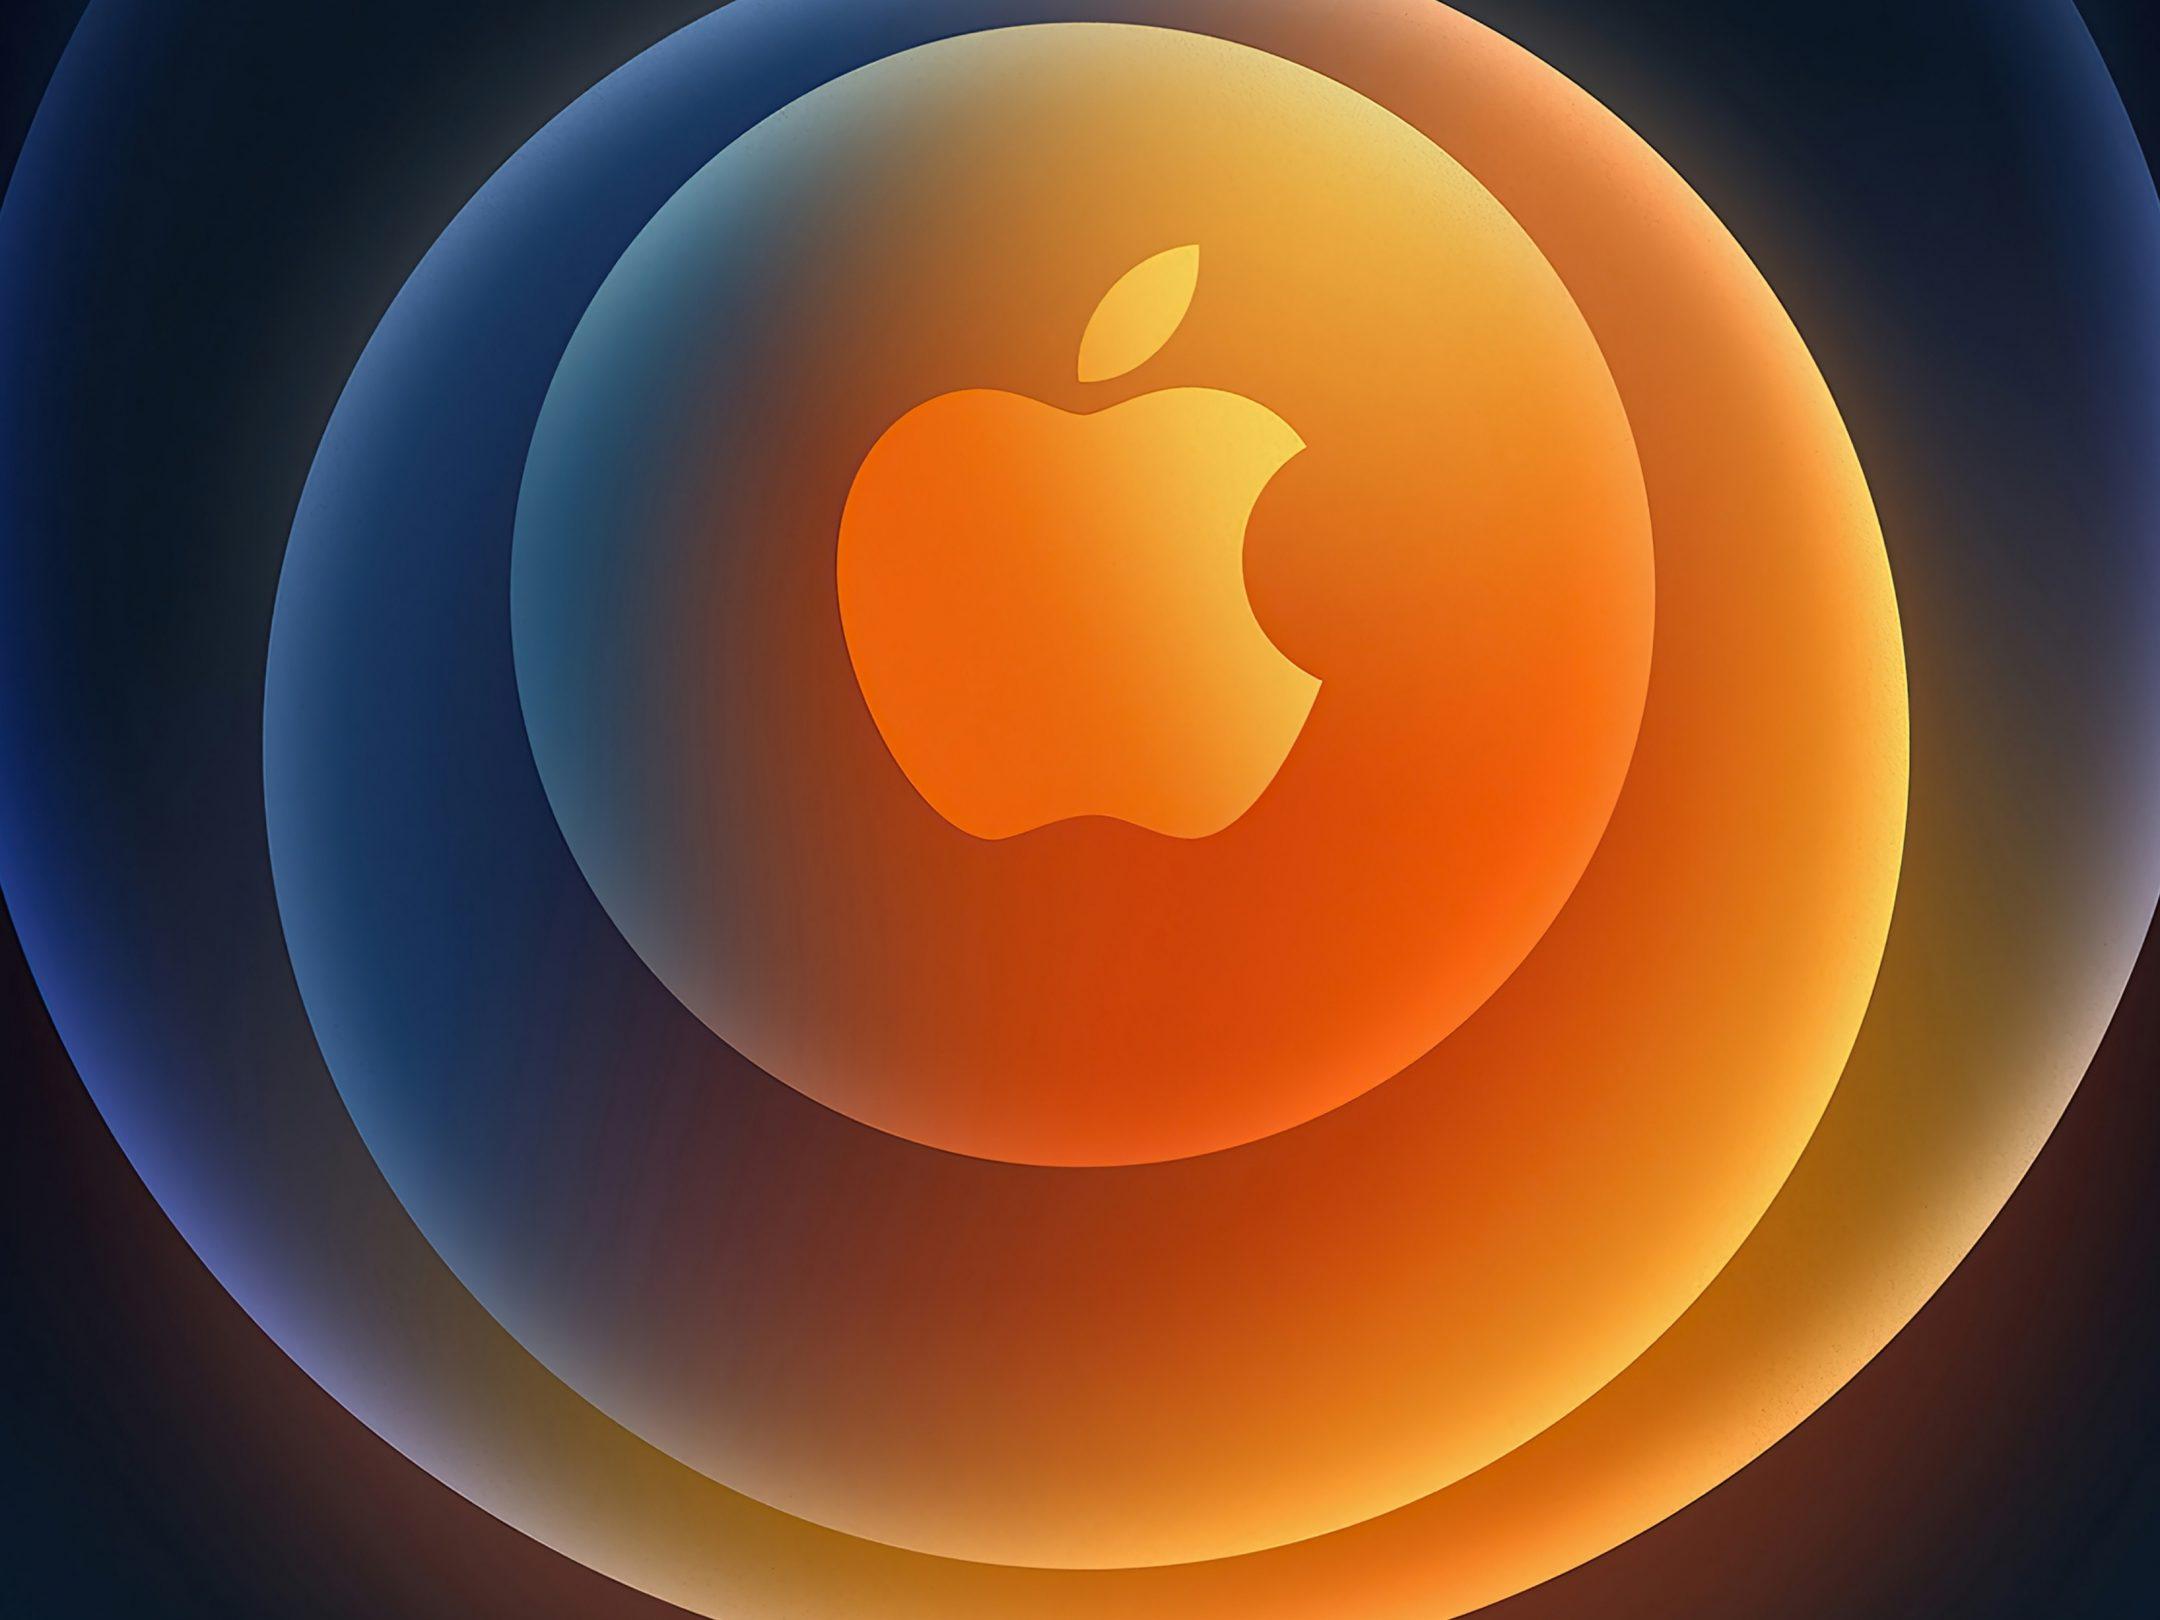 2160x1620 iPad wallpaper 4k iPhone 12 Apple Logo Circles iPad Wallpaper 2160x1620 pixels resolution